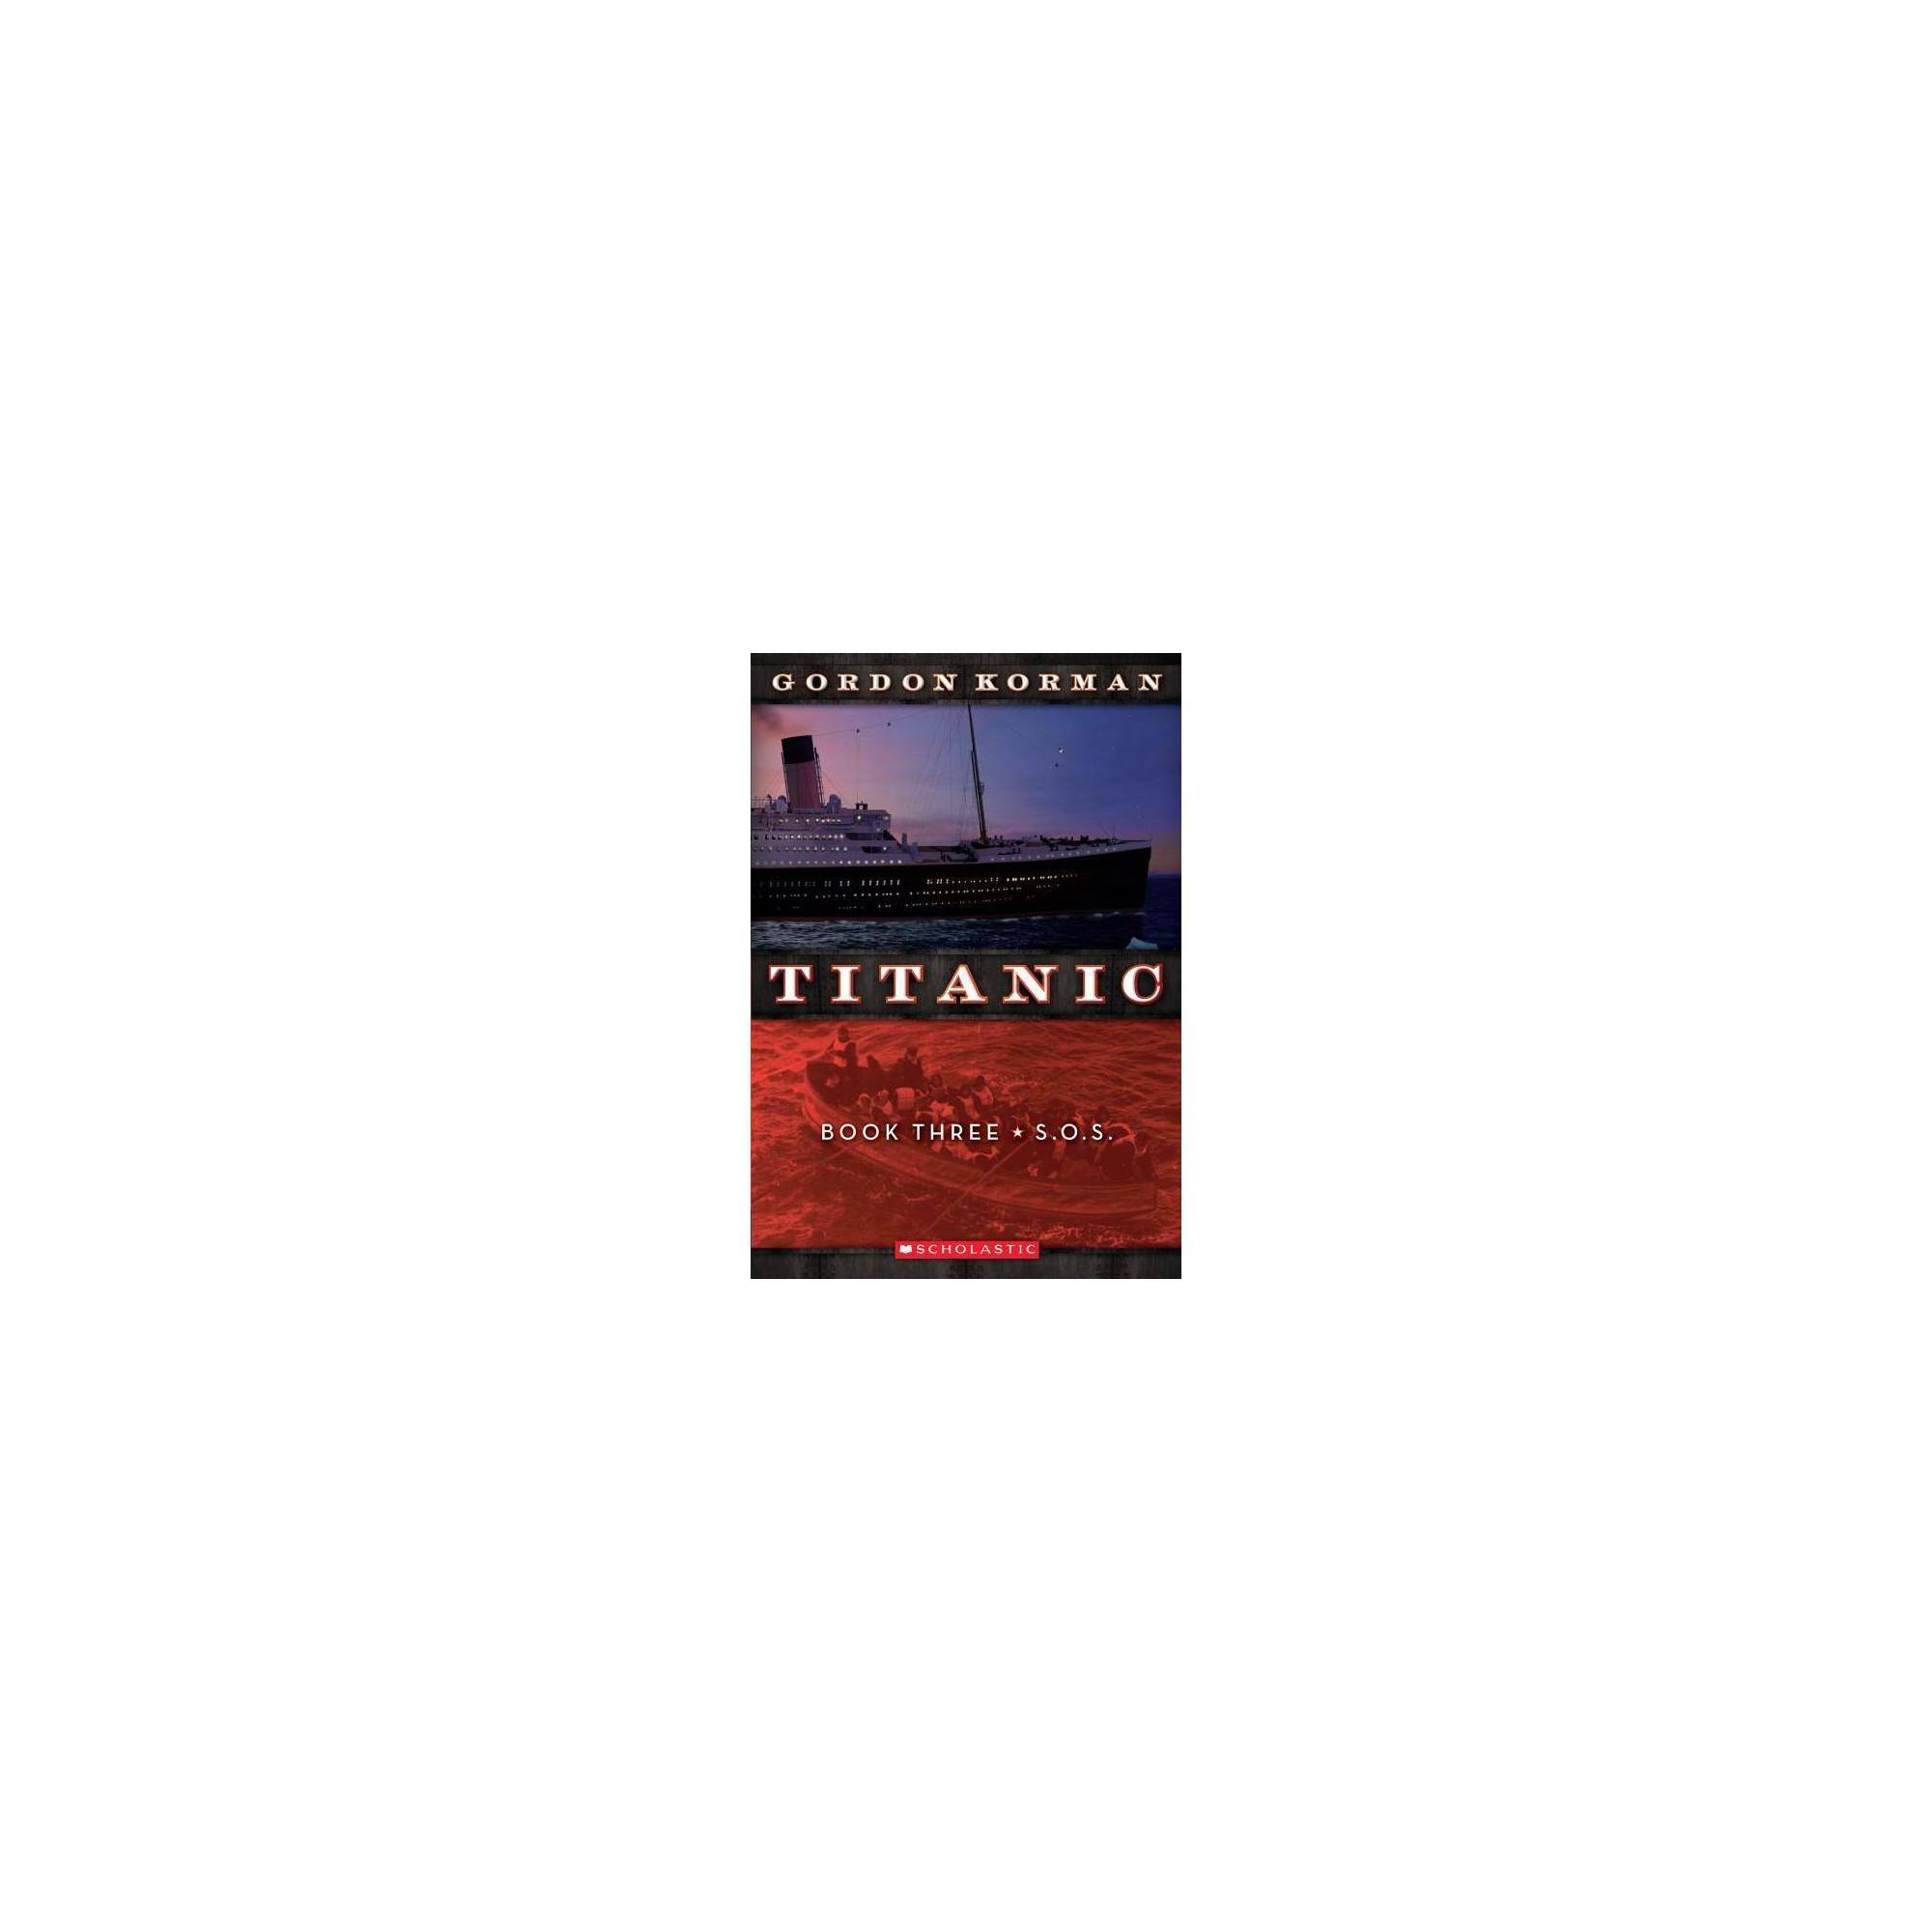 S.O.S. - (Titanic (Paperback)) by Gordon Korman (Paperback)